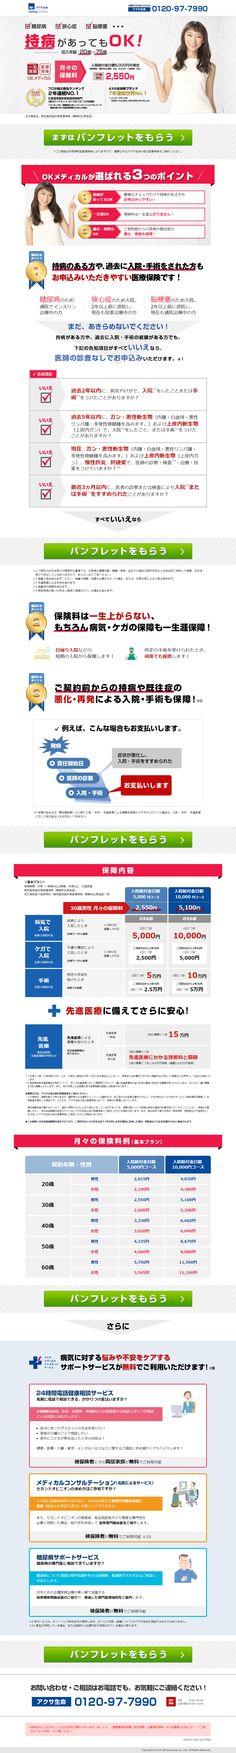 http://www.axa.co.jp/ads/OK_Medical_201504?utm_source=facebook&utm_medium=display&utm_campaign=ok-medical&utm_content=1200_628_2&utm_term=PC1603_RTG